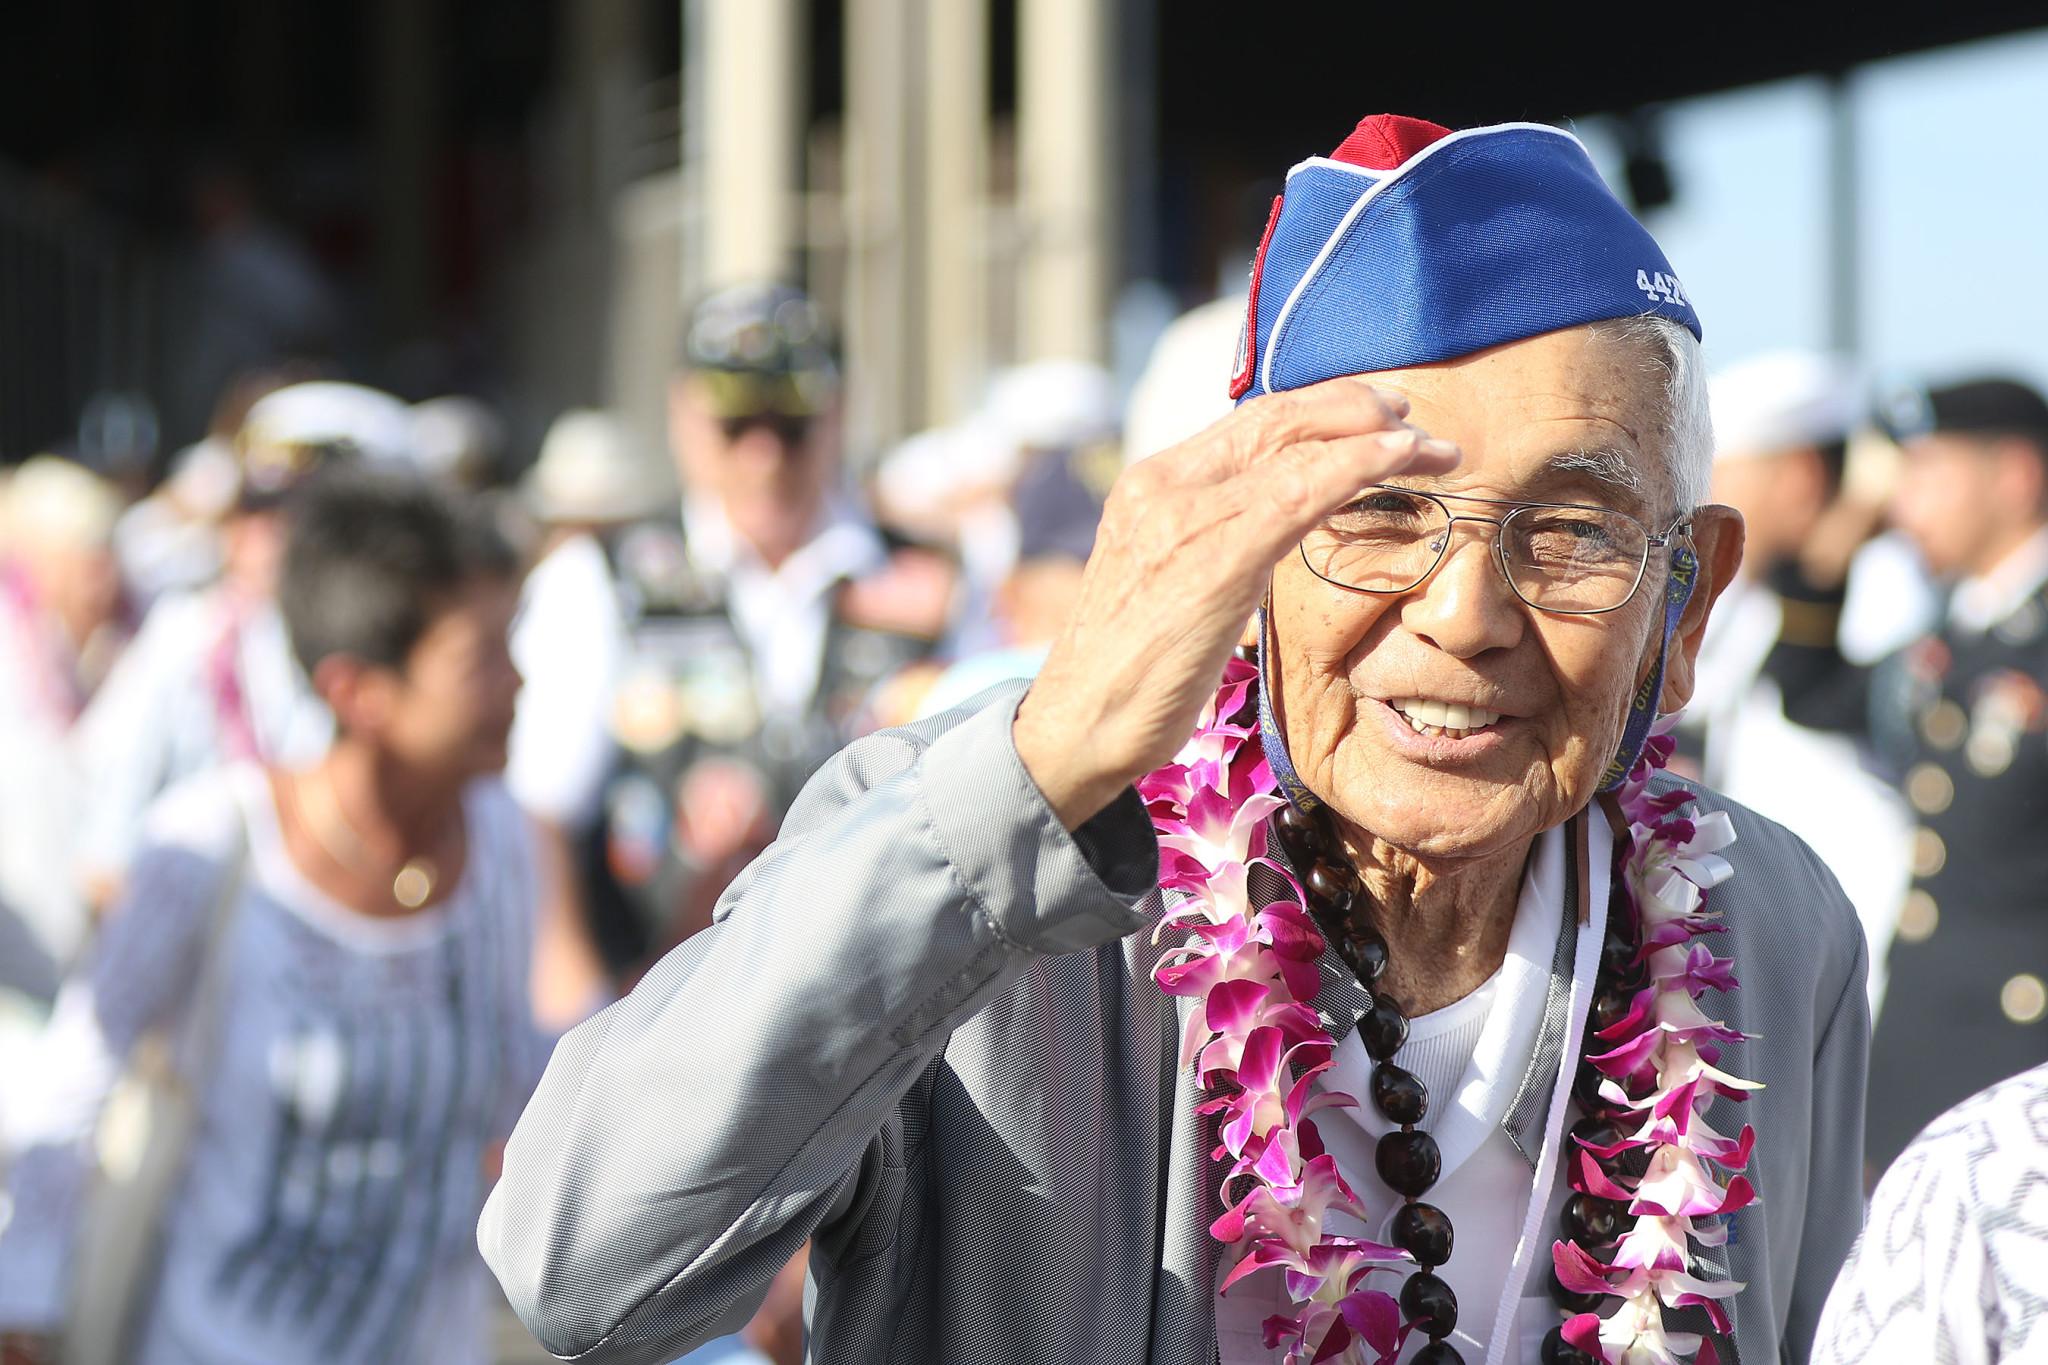 <p>World War II veteran Robert Kishinamiof the 442nd Regimental Combat Team returns a salute from active-duty personnel.</p>